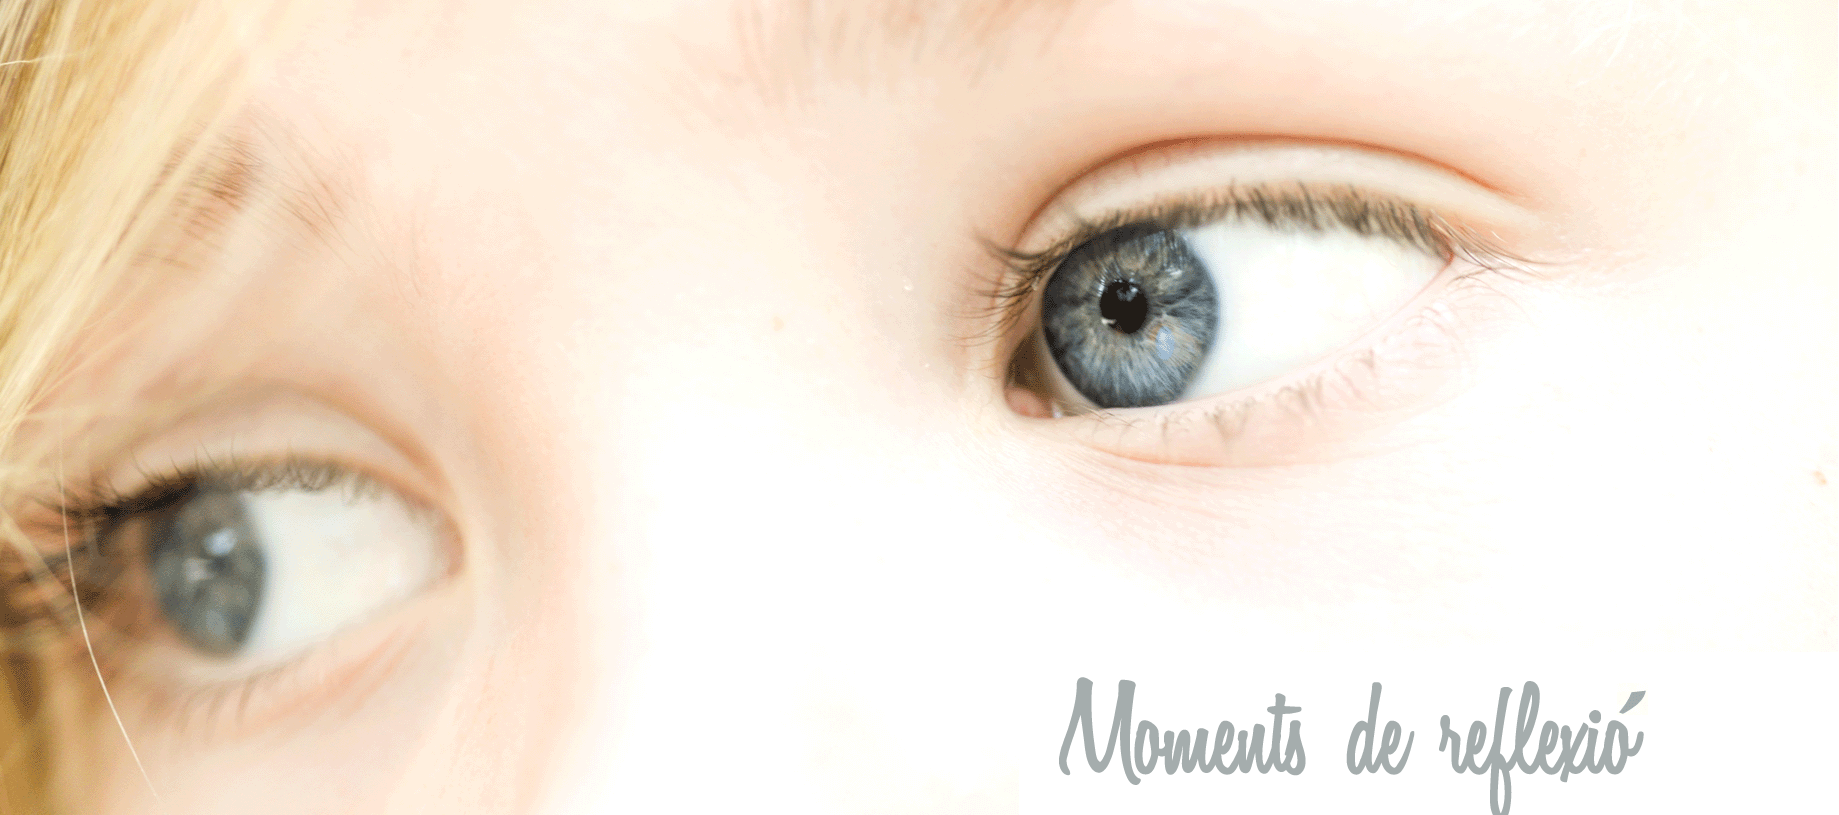 Moments_de_reflexio